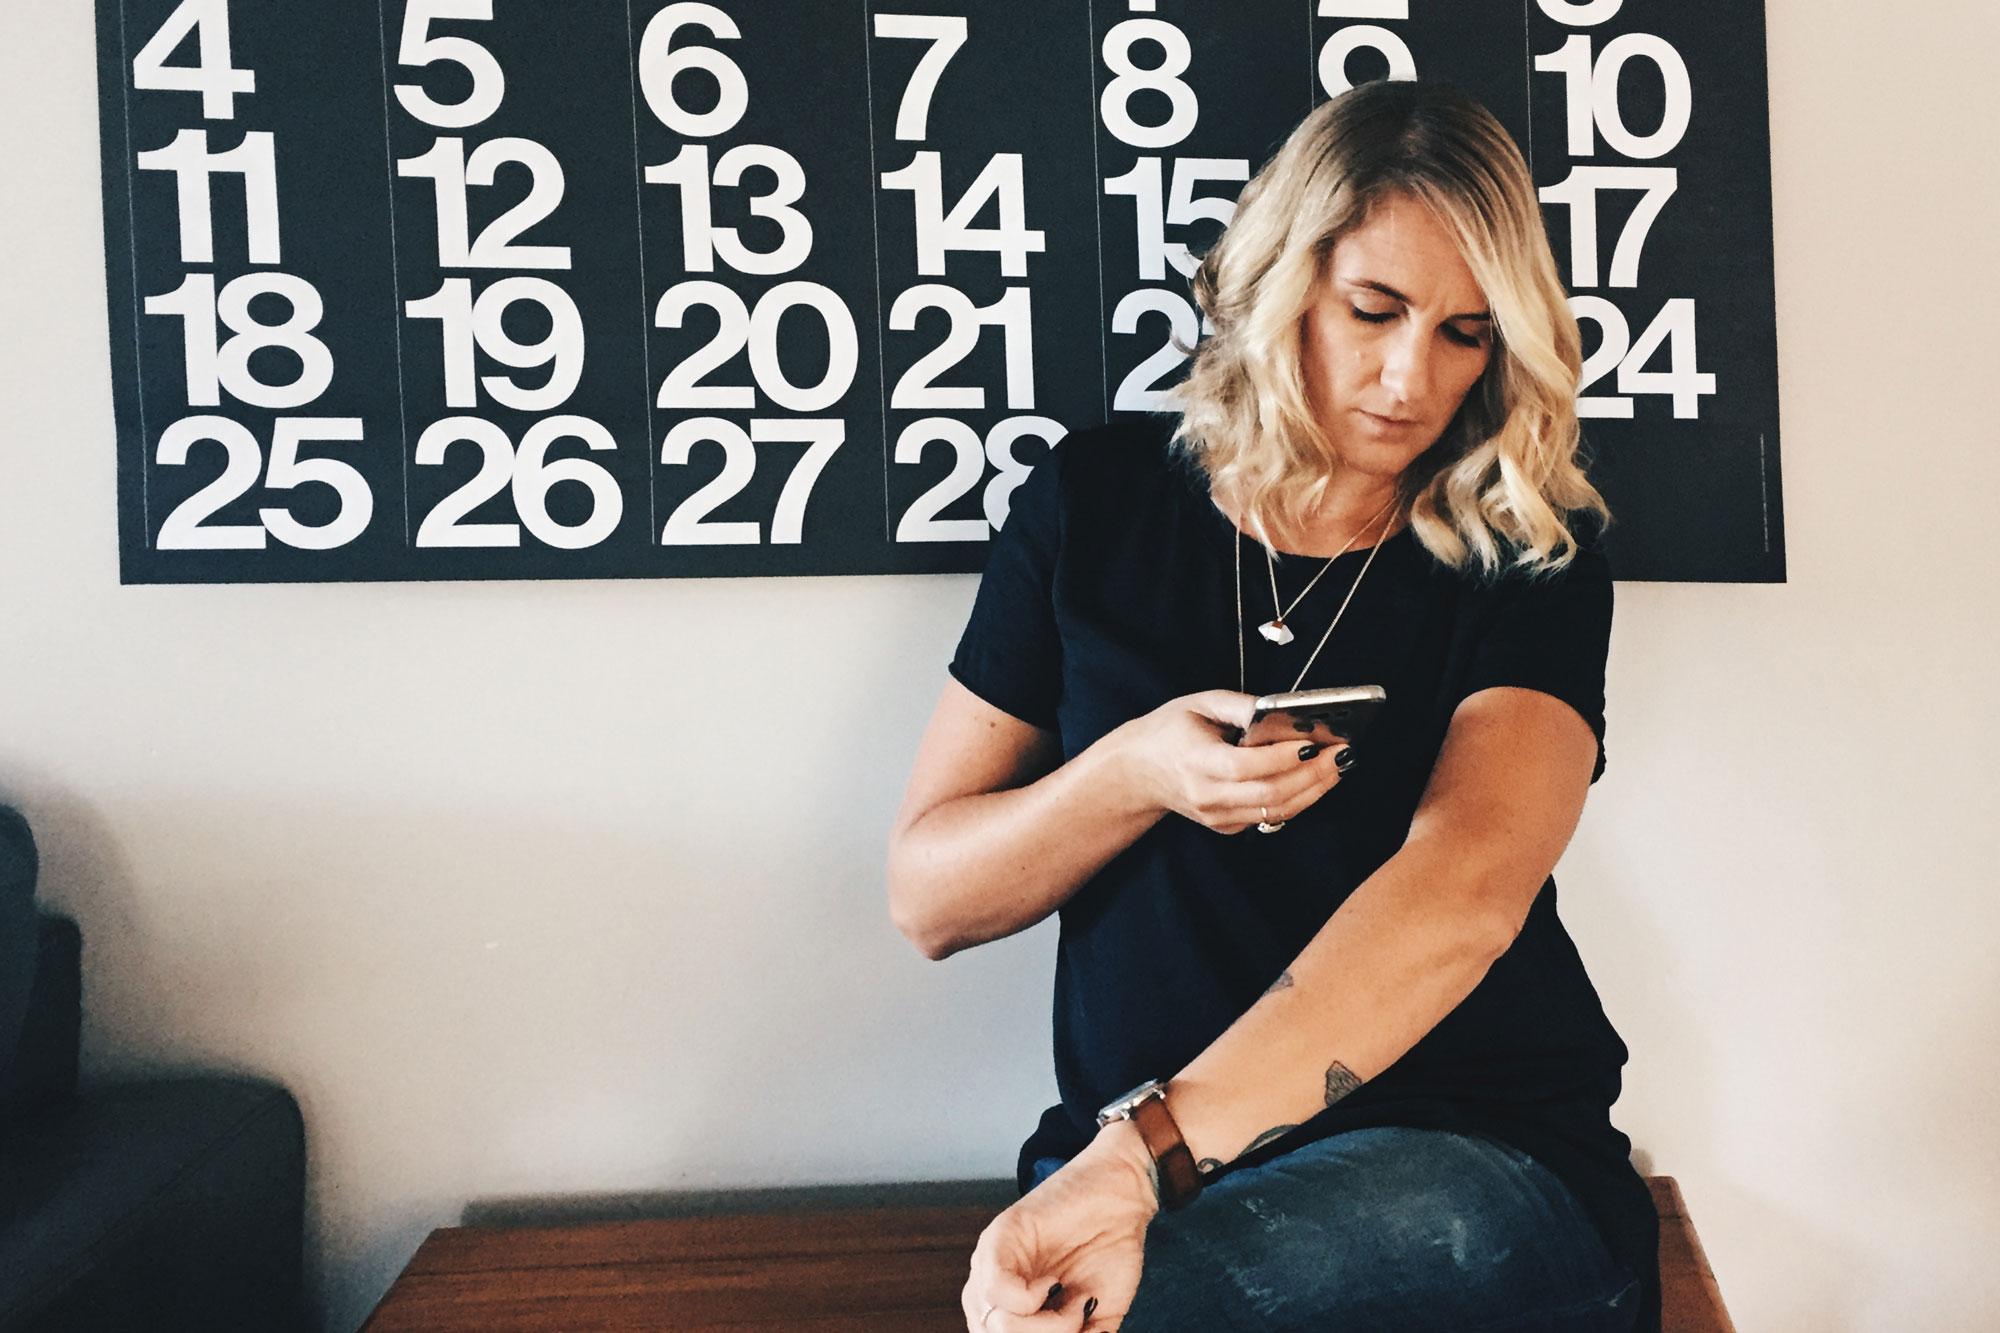 New Zealand's Top Mummy Blogger Melanoma App